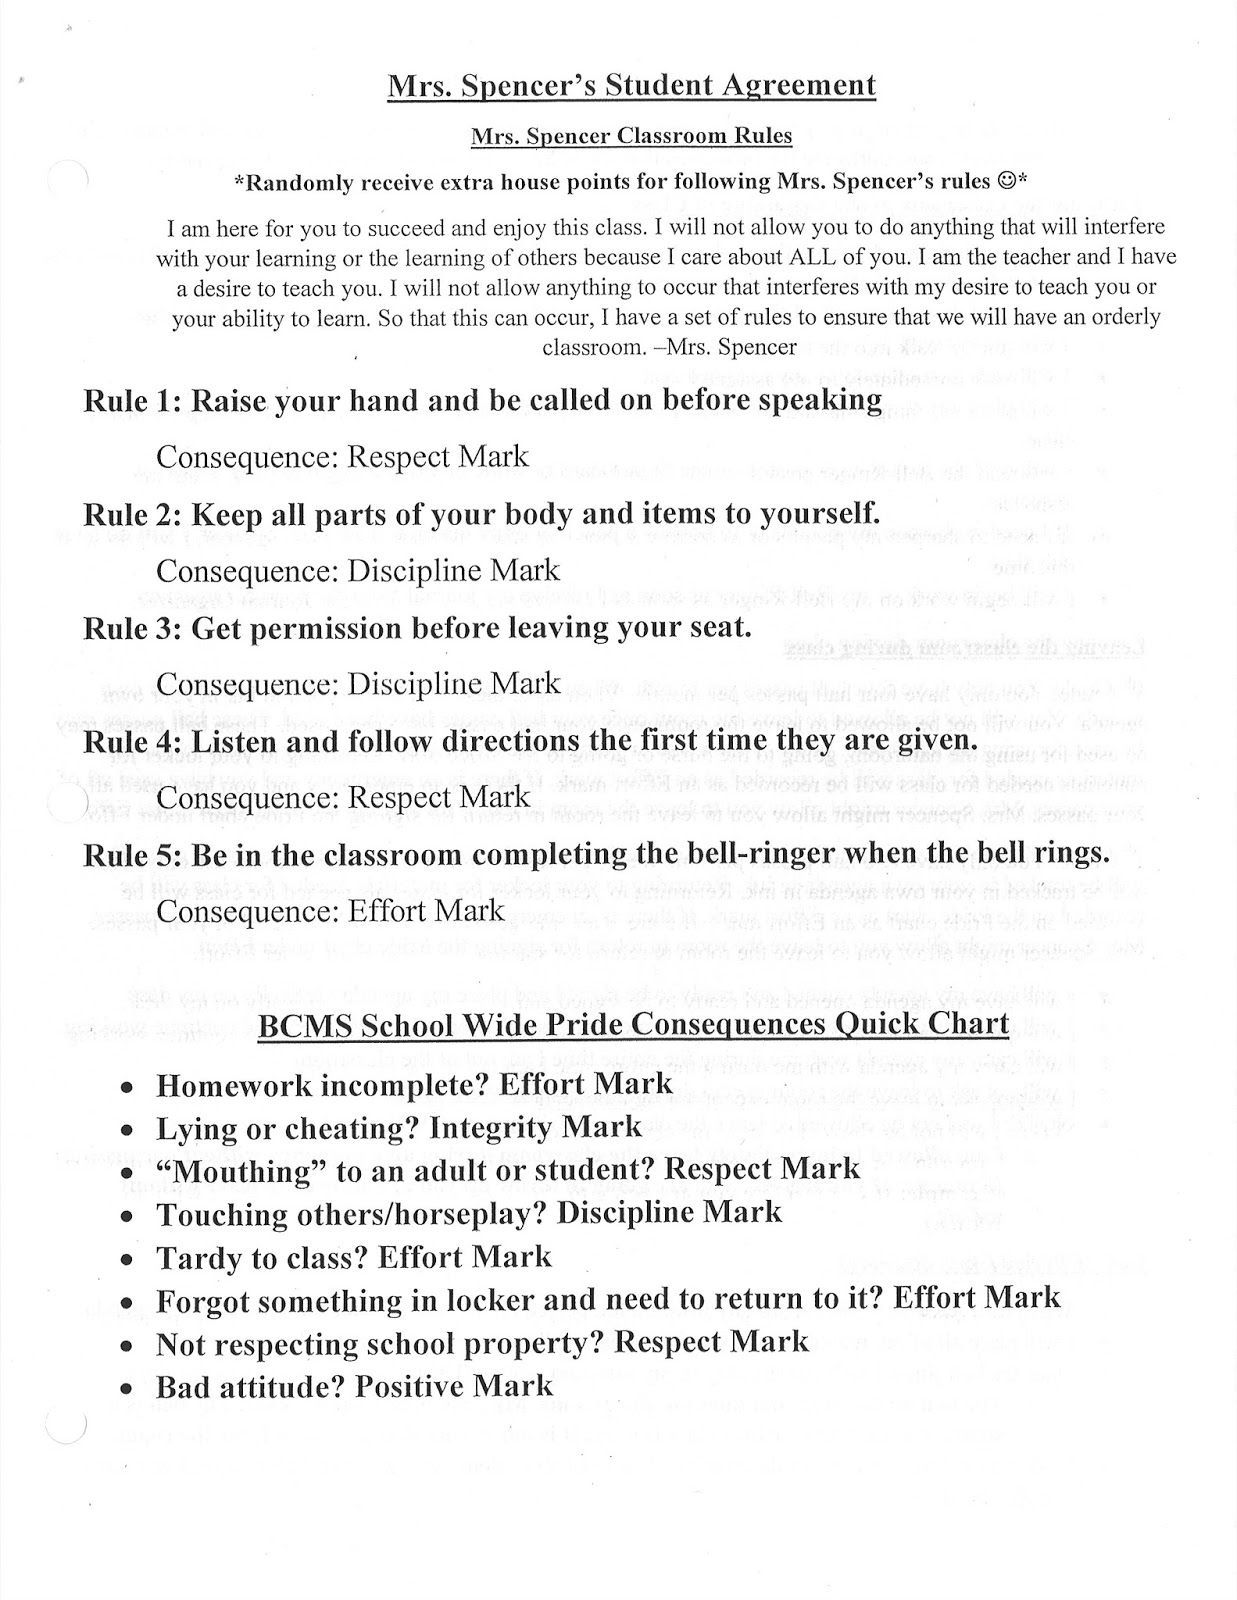 bcms homework page